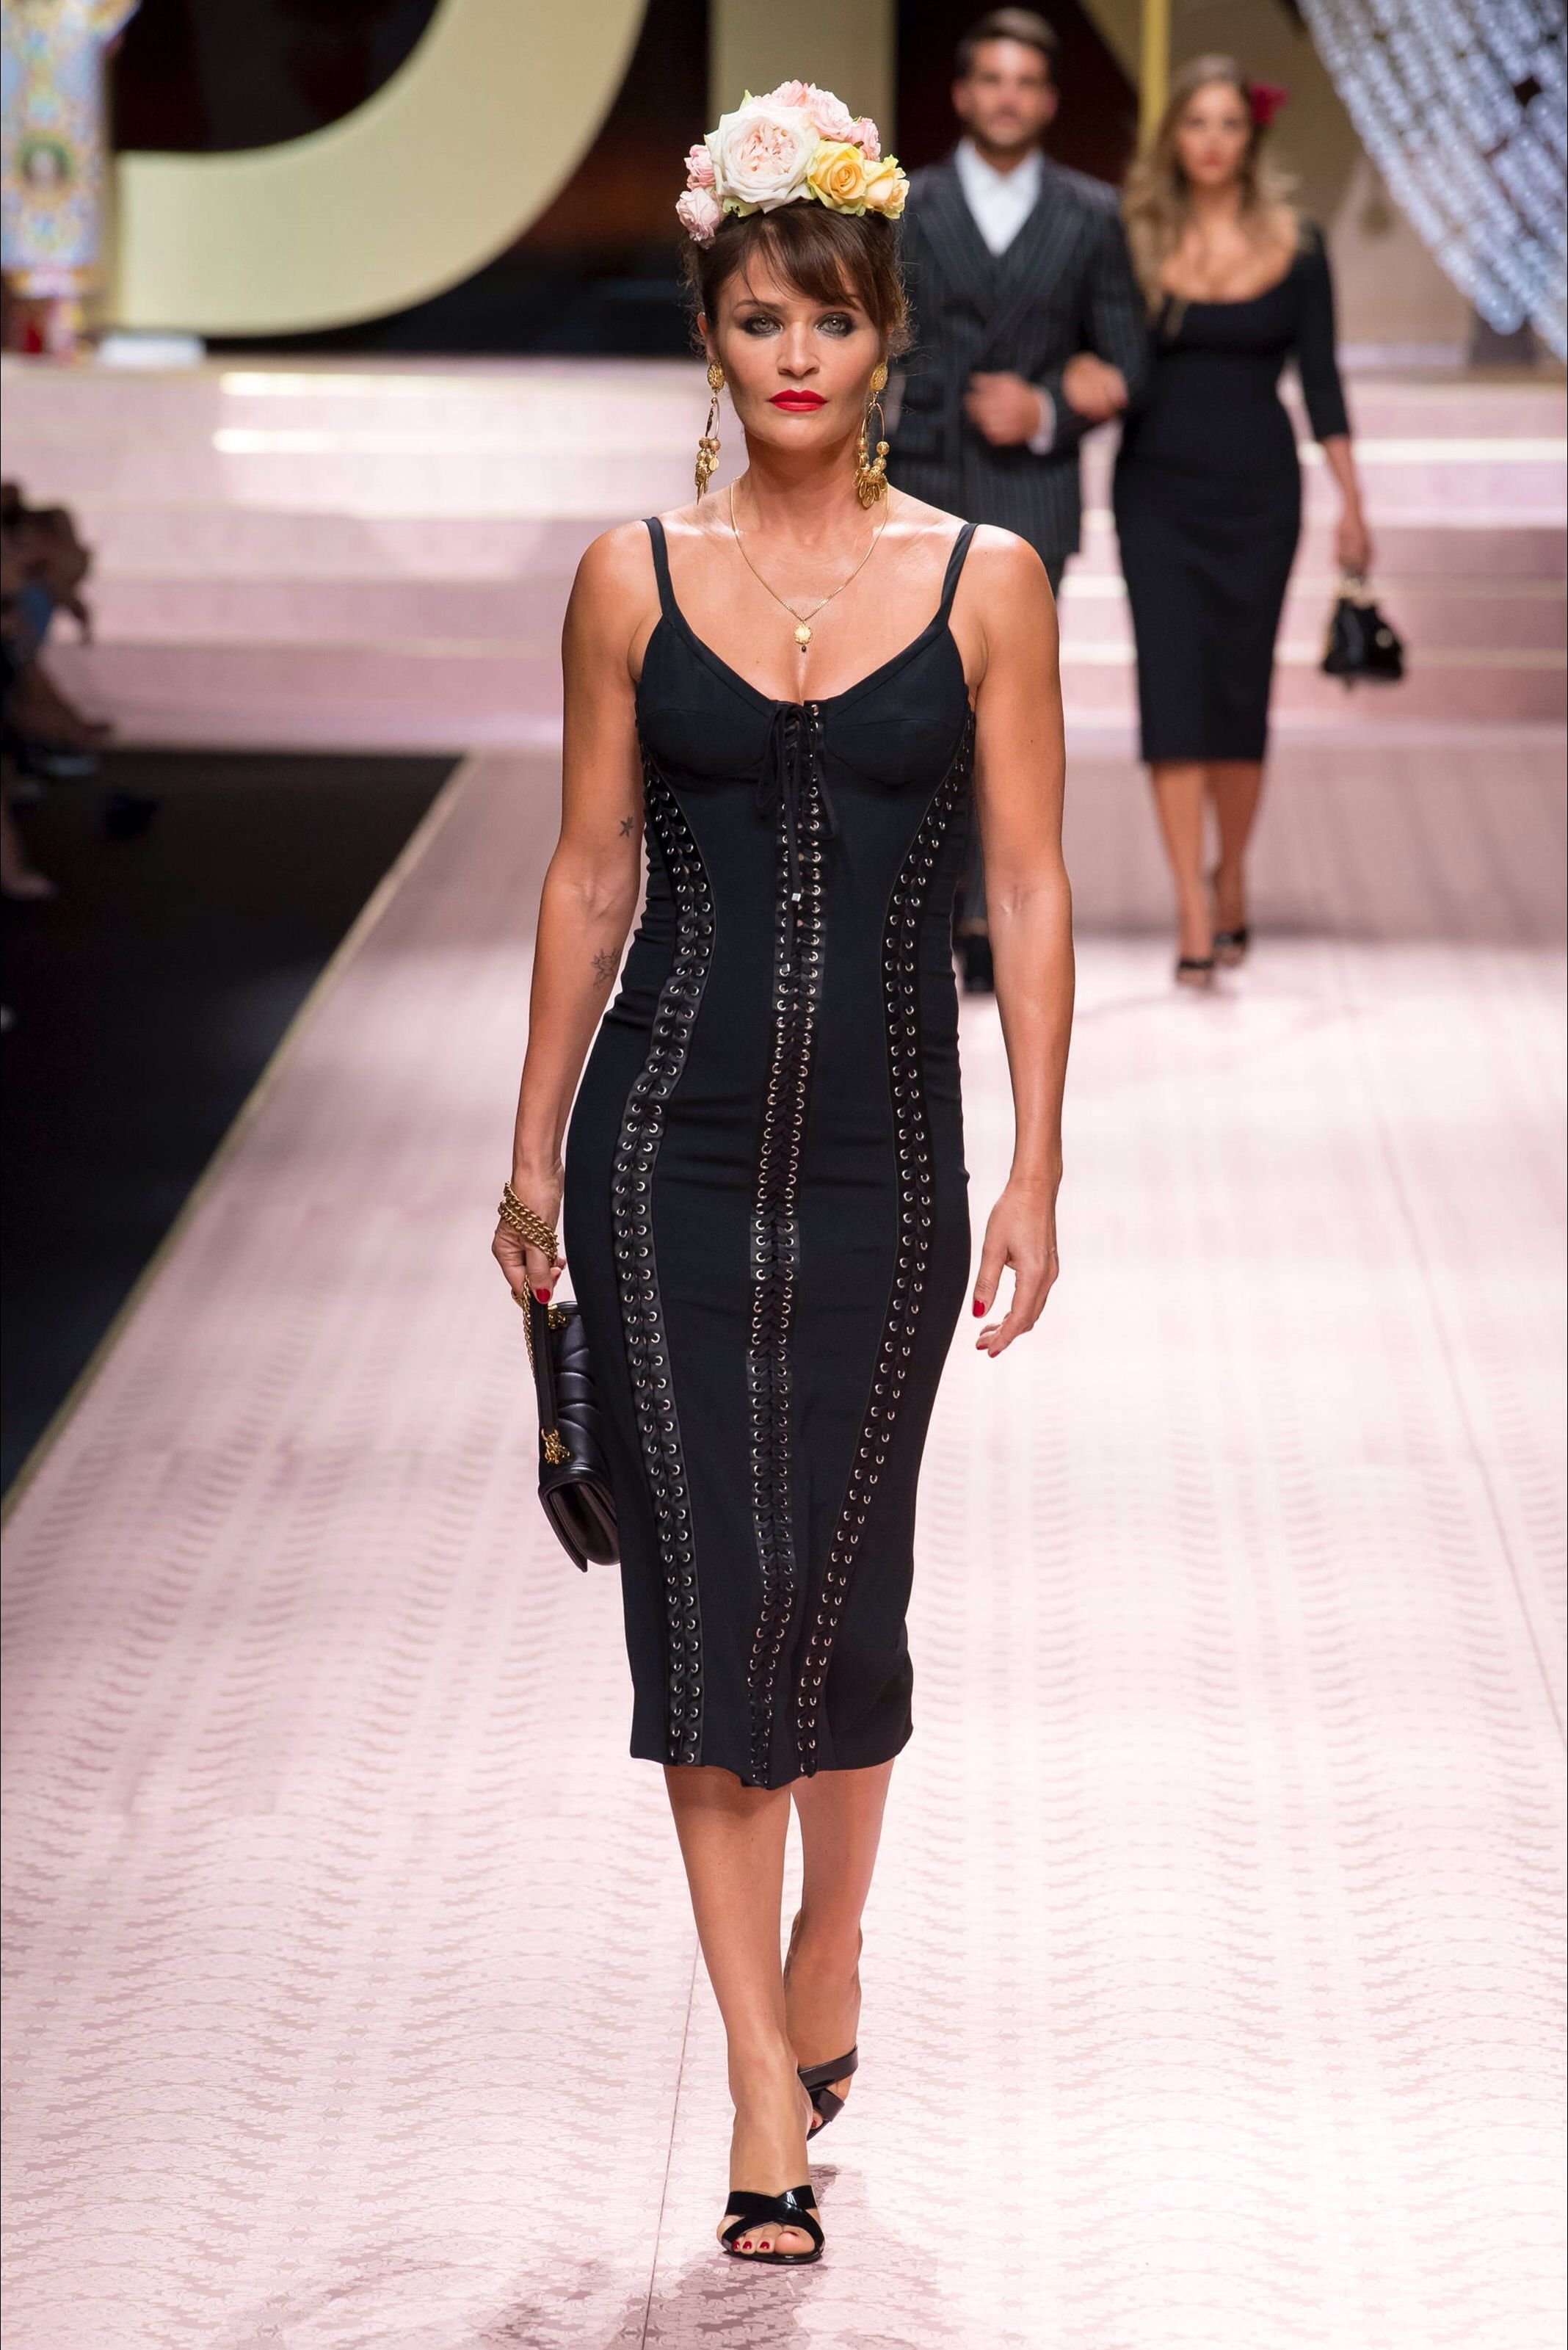 c4d7c592bb75 Spring Summer 2019 Ready to Wear- Dolce   Gabbana